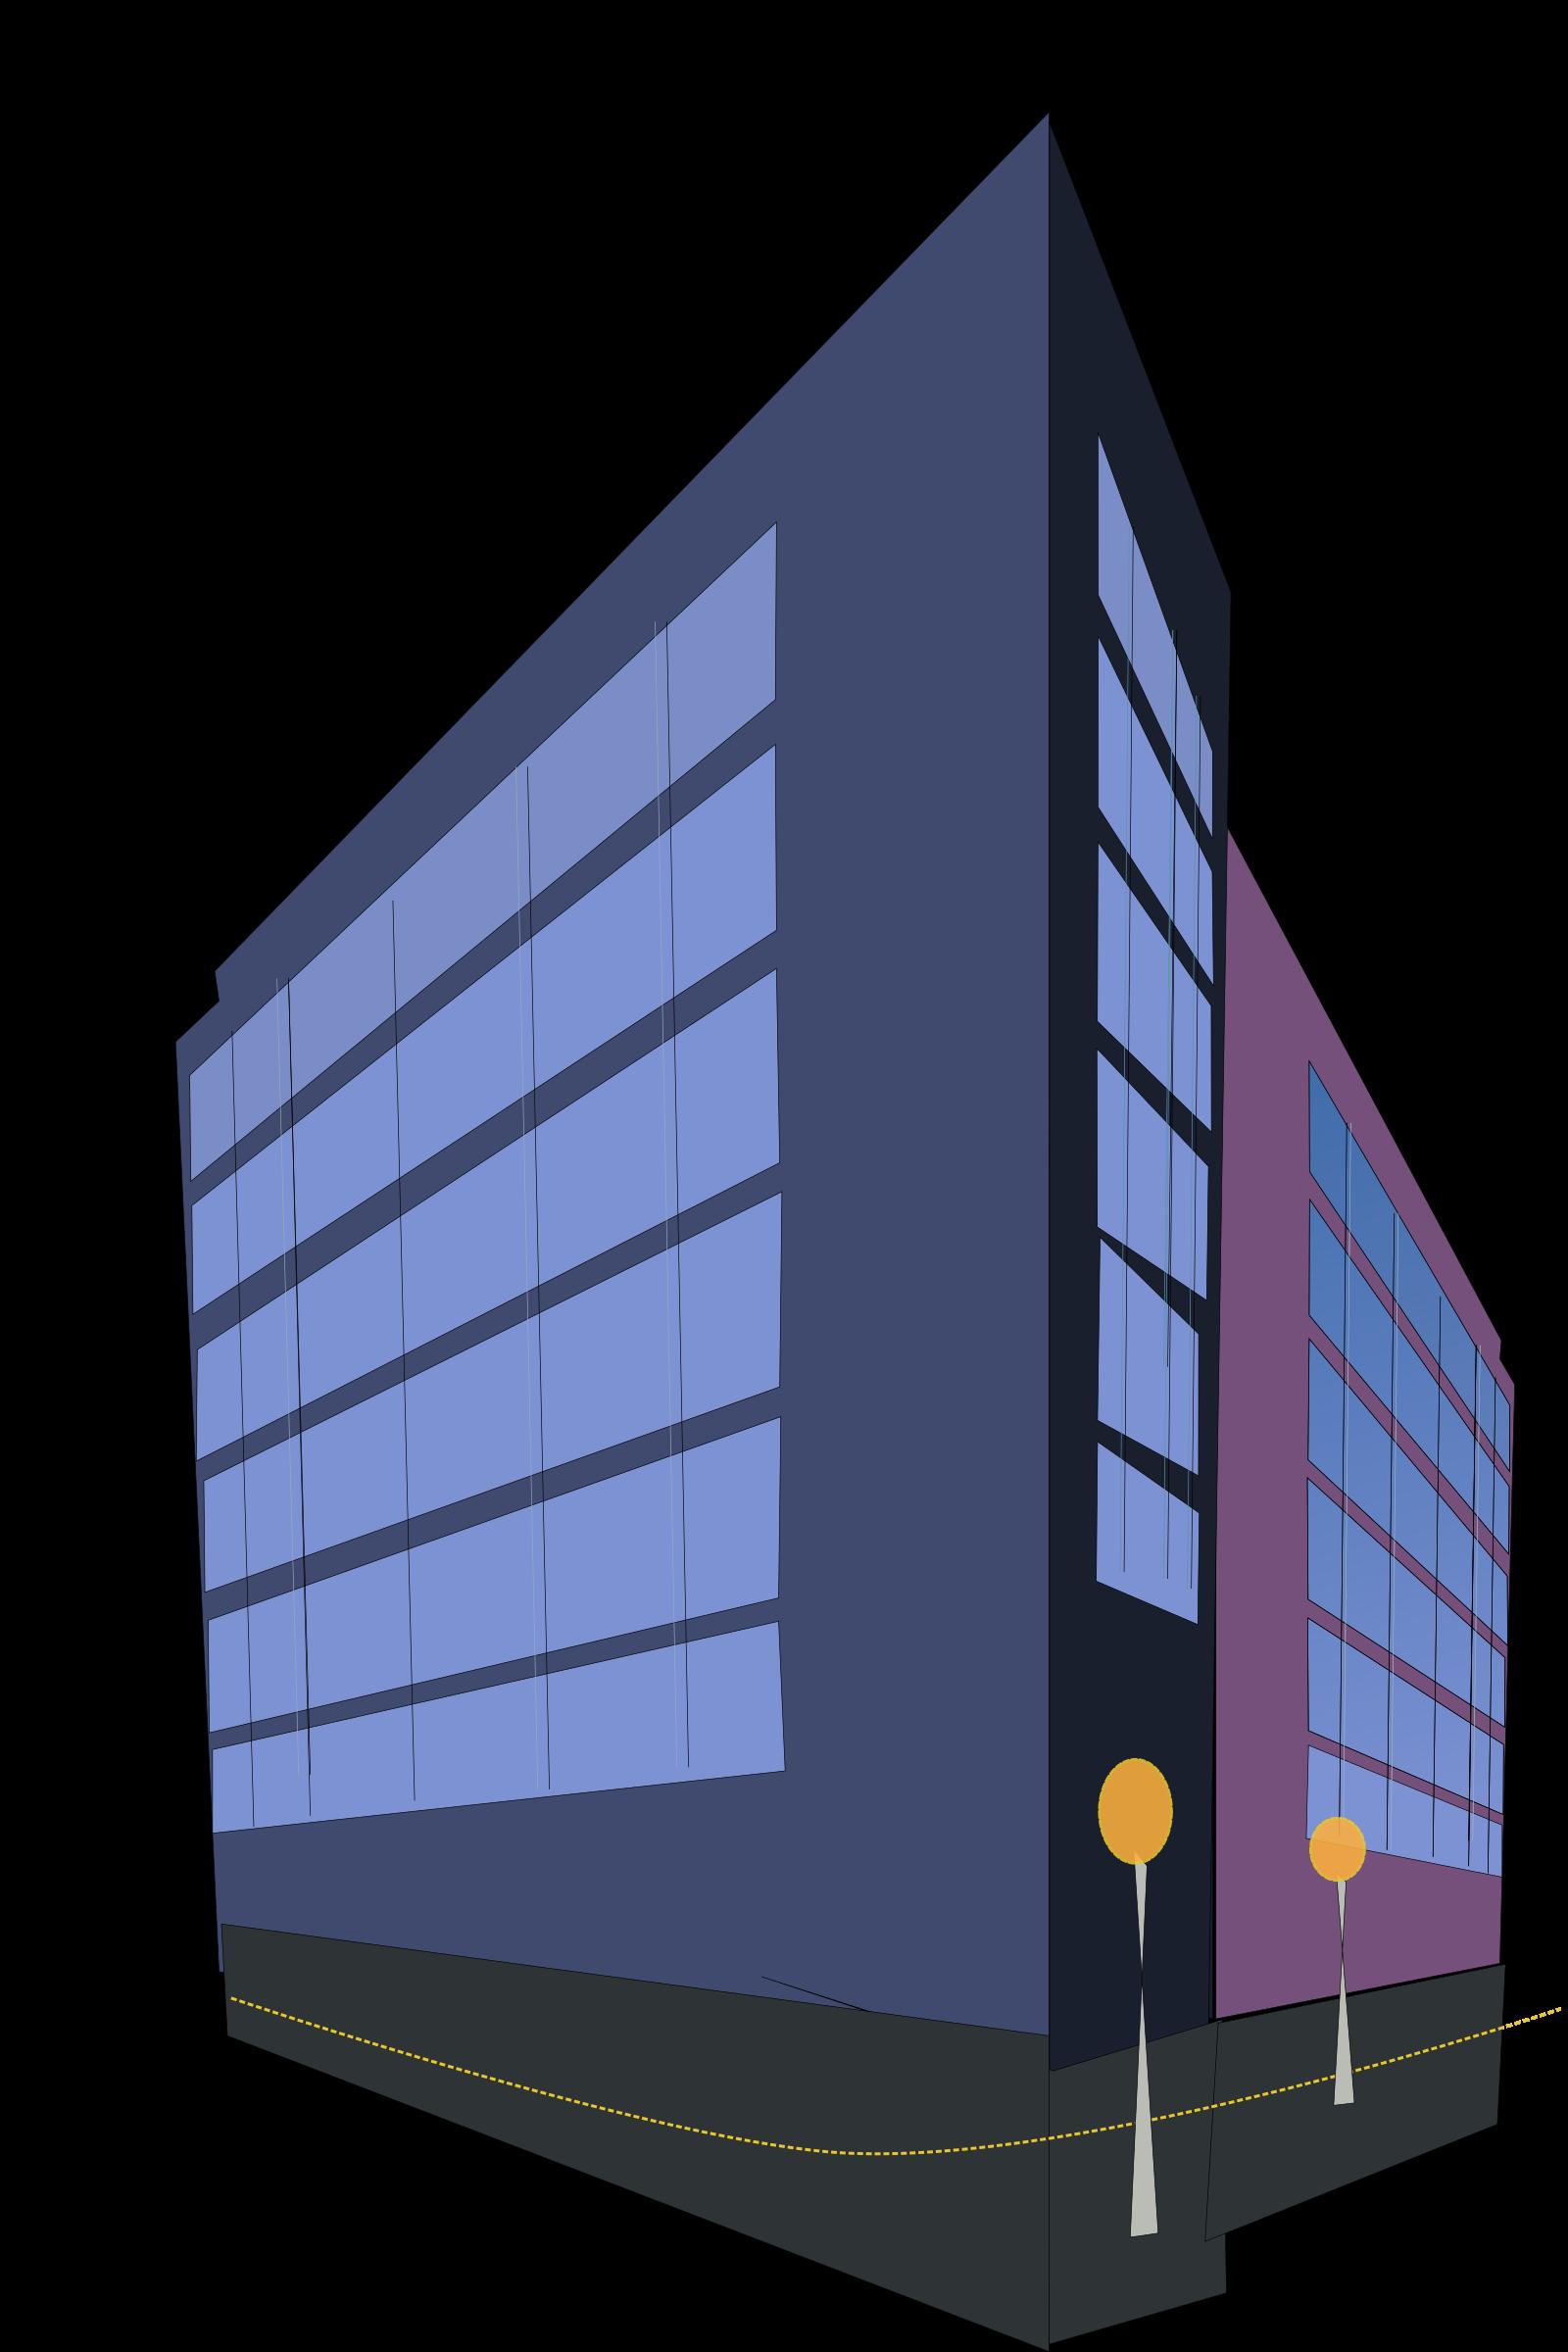 BIG IMAGE (PNG) - Big Building PNG